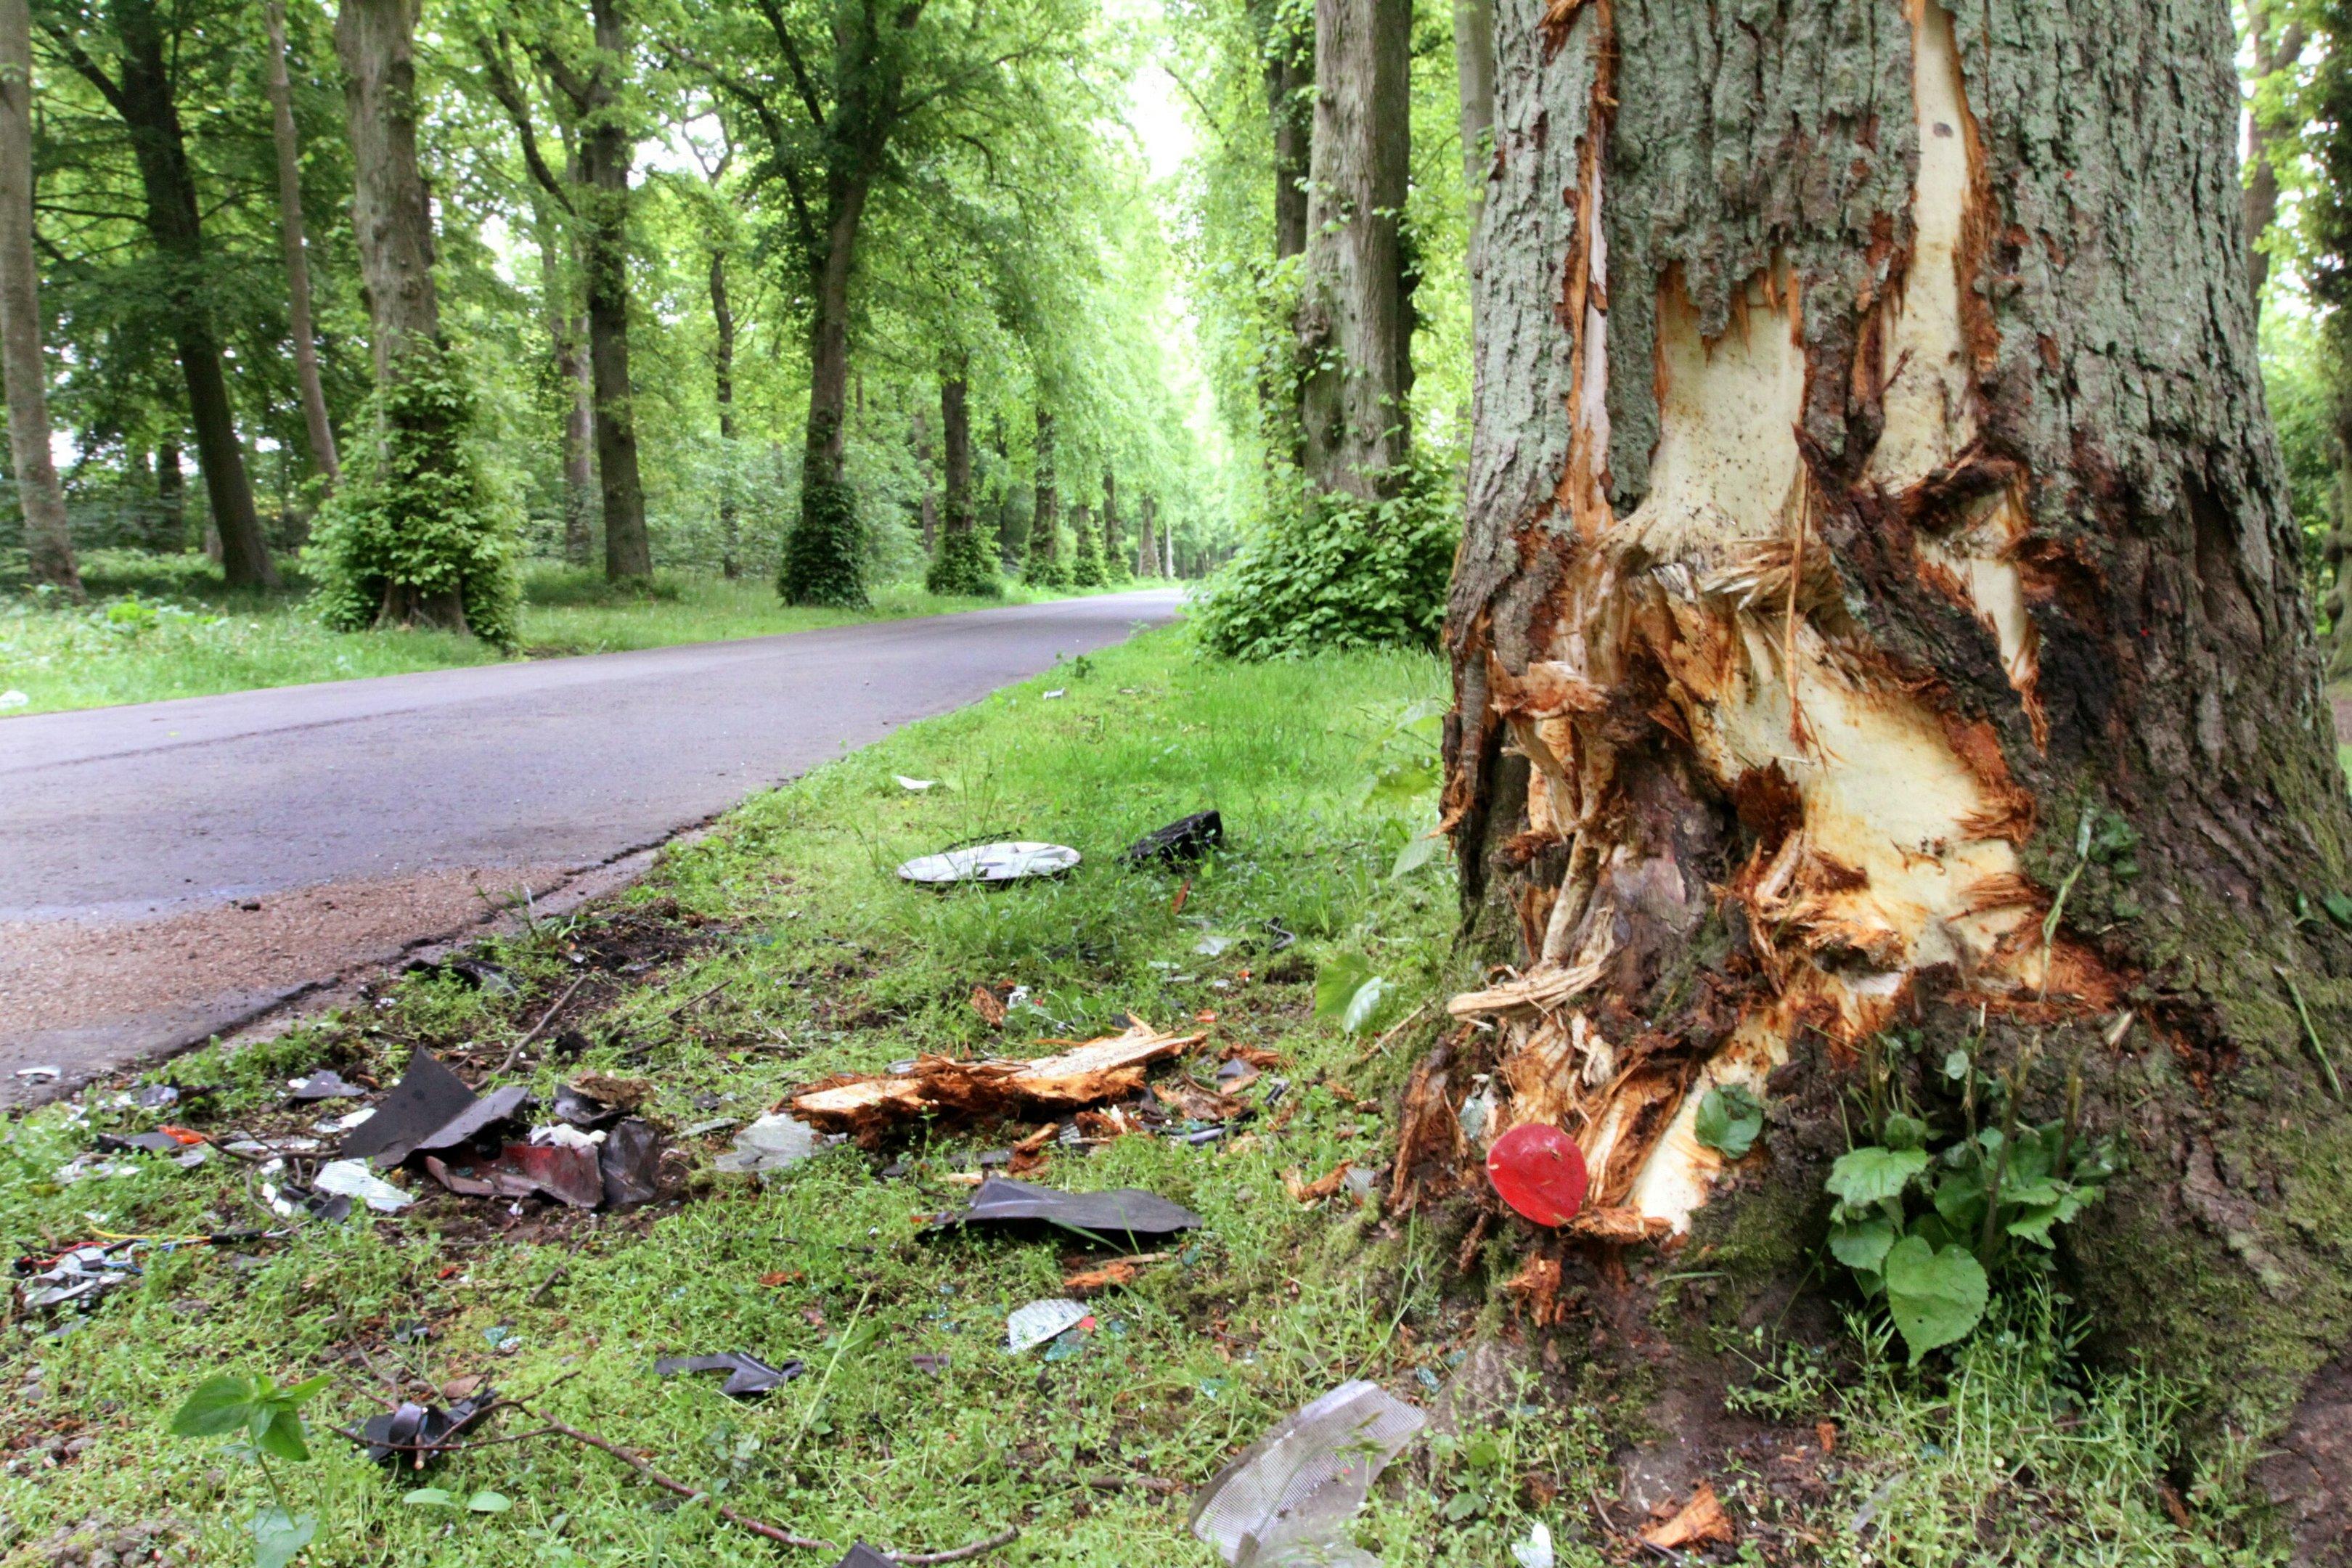 The scene of the crash at Camperdown Park.